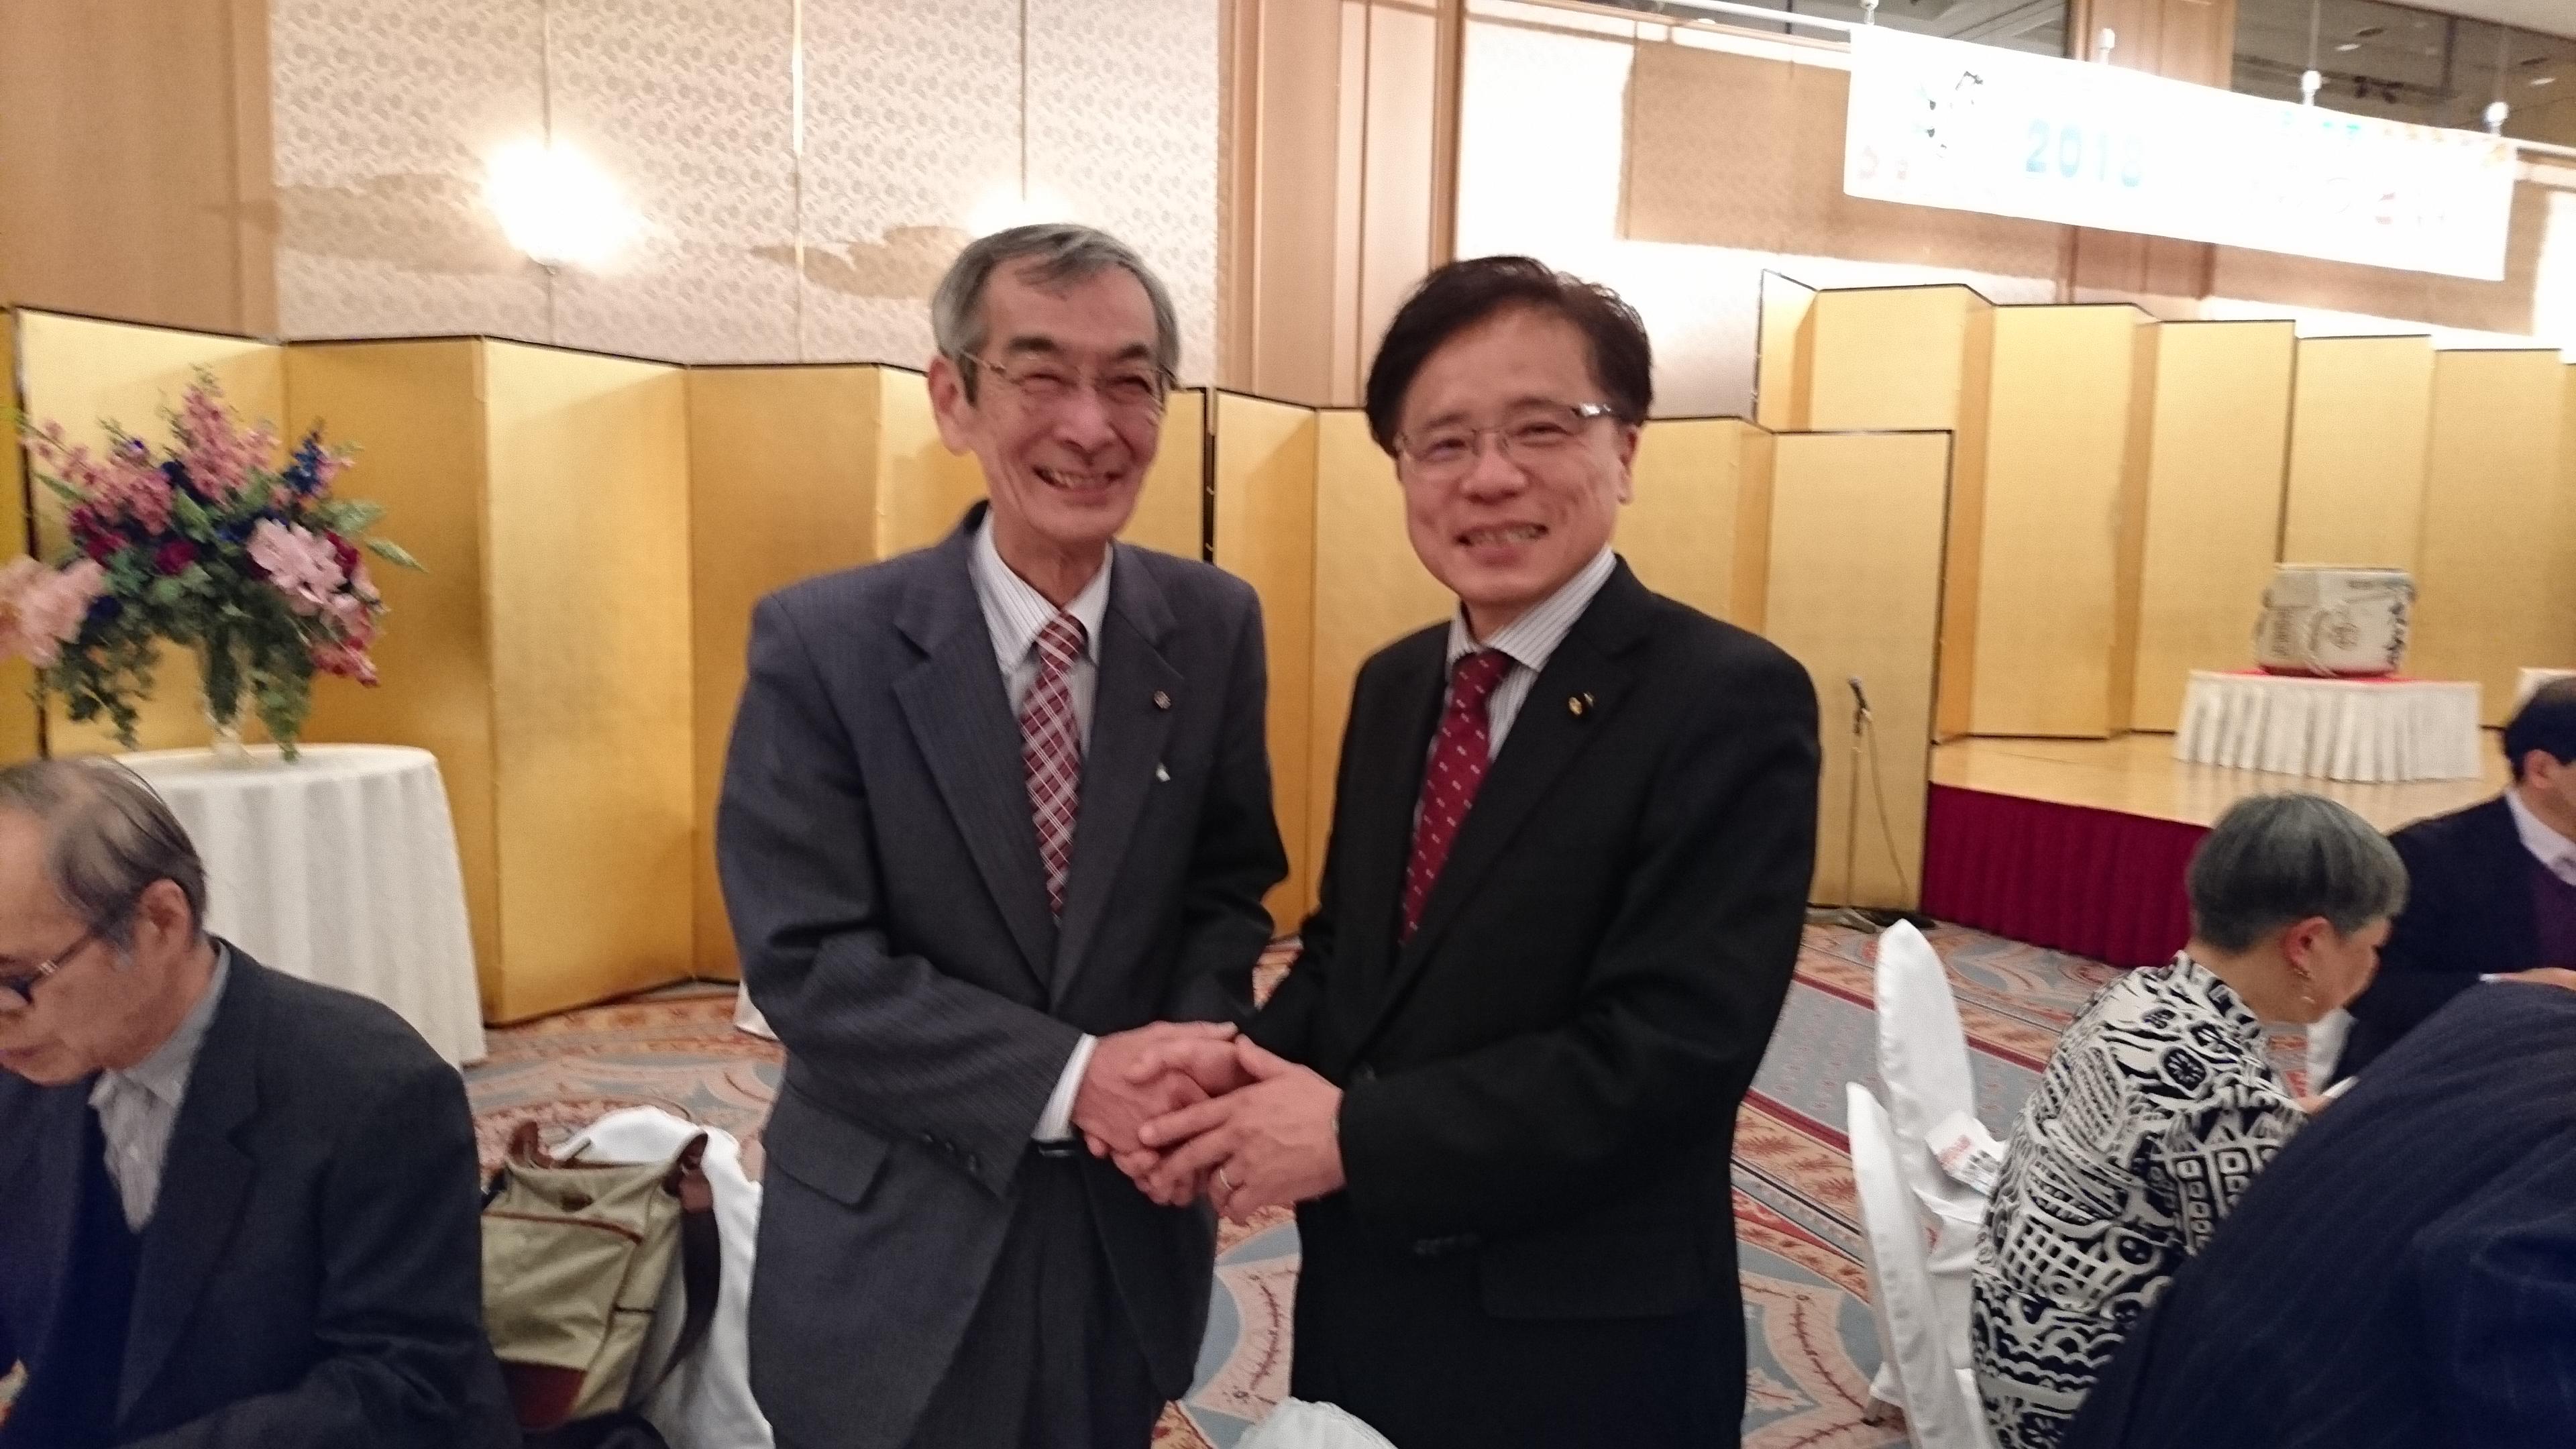 http://www.inoue-satoshi.com/diary/DSC_0646.JPG